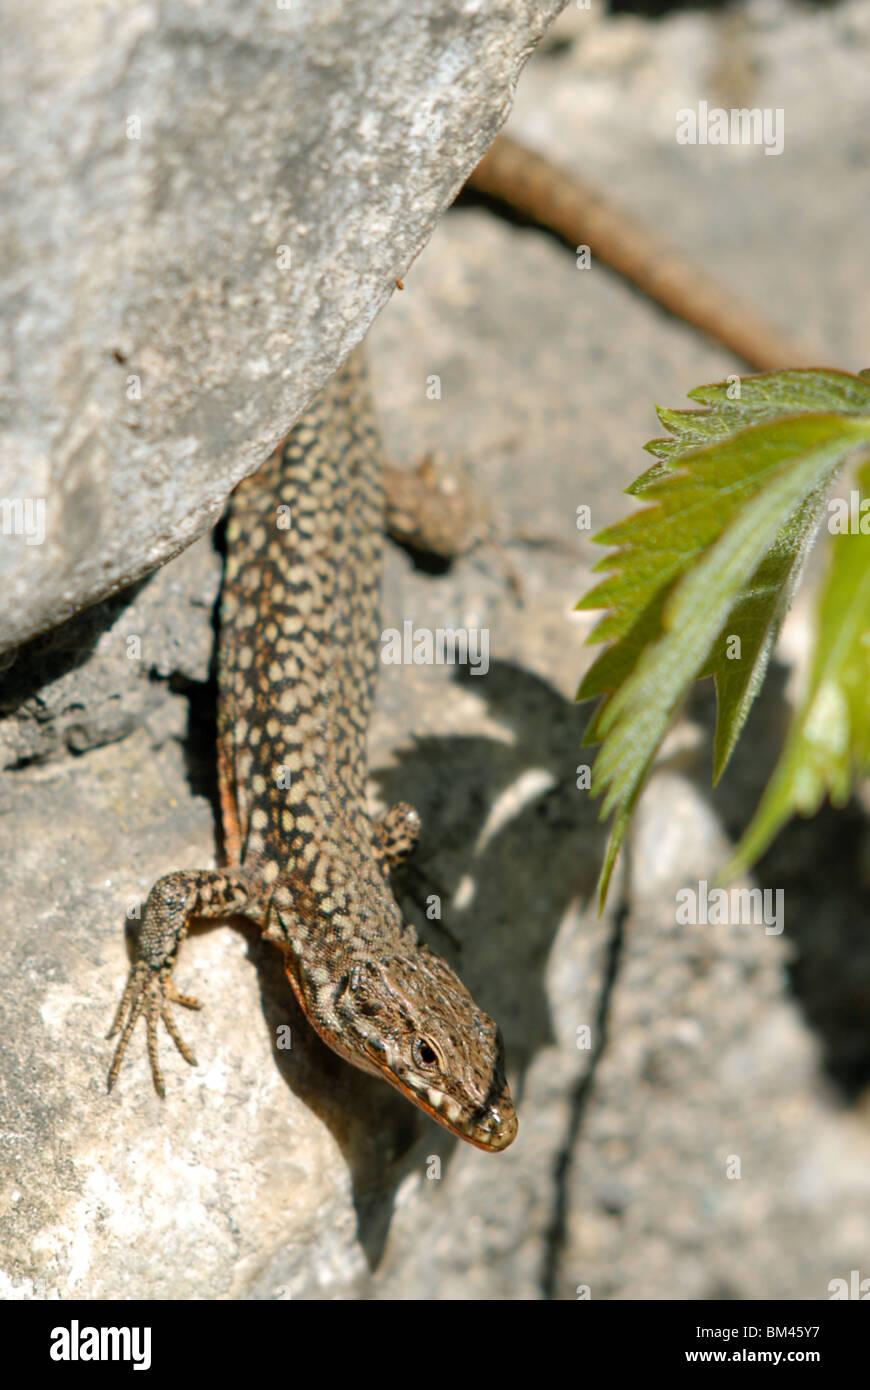 Common or European Wall lizard, Podarcis muralis, Susa, Piedmont, Italy. - Stock Image